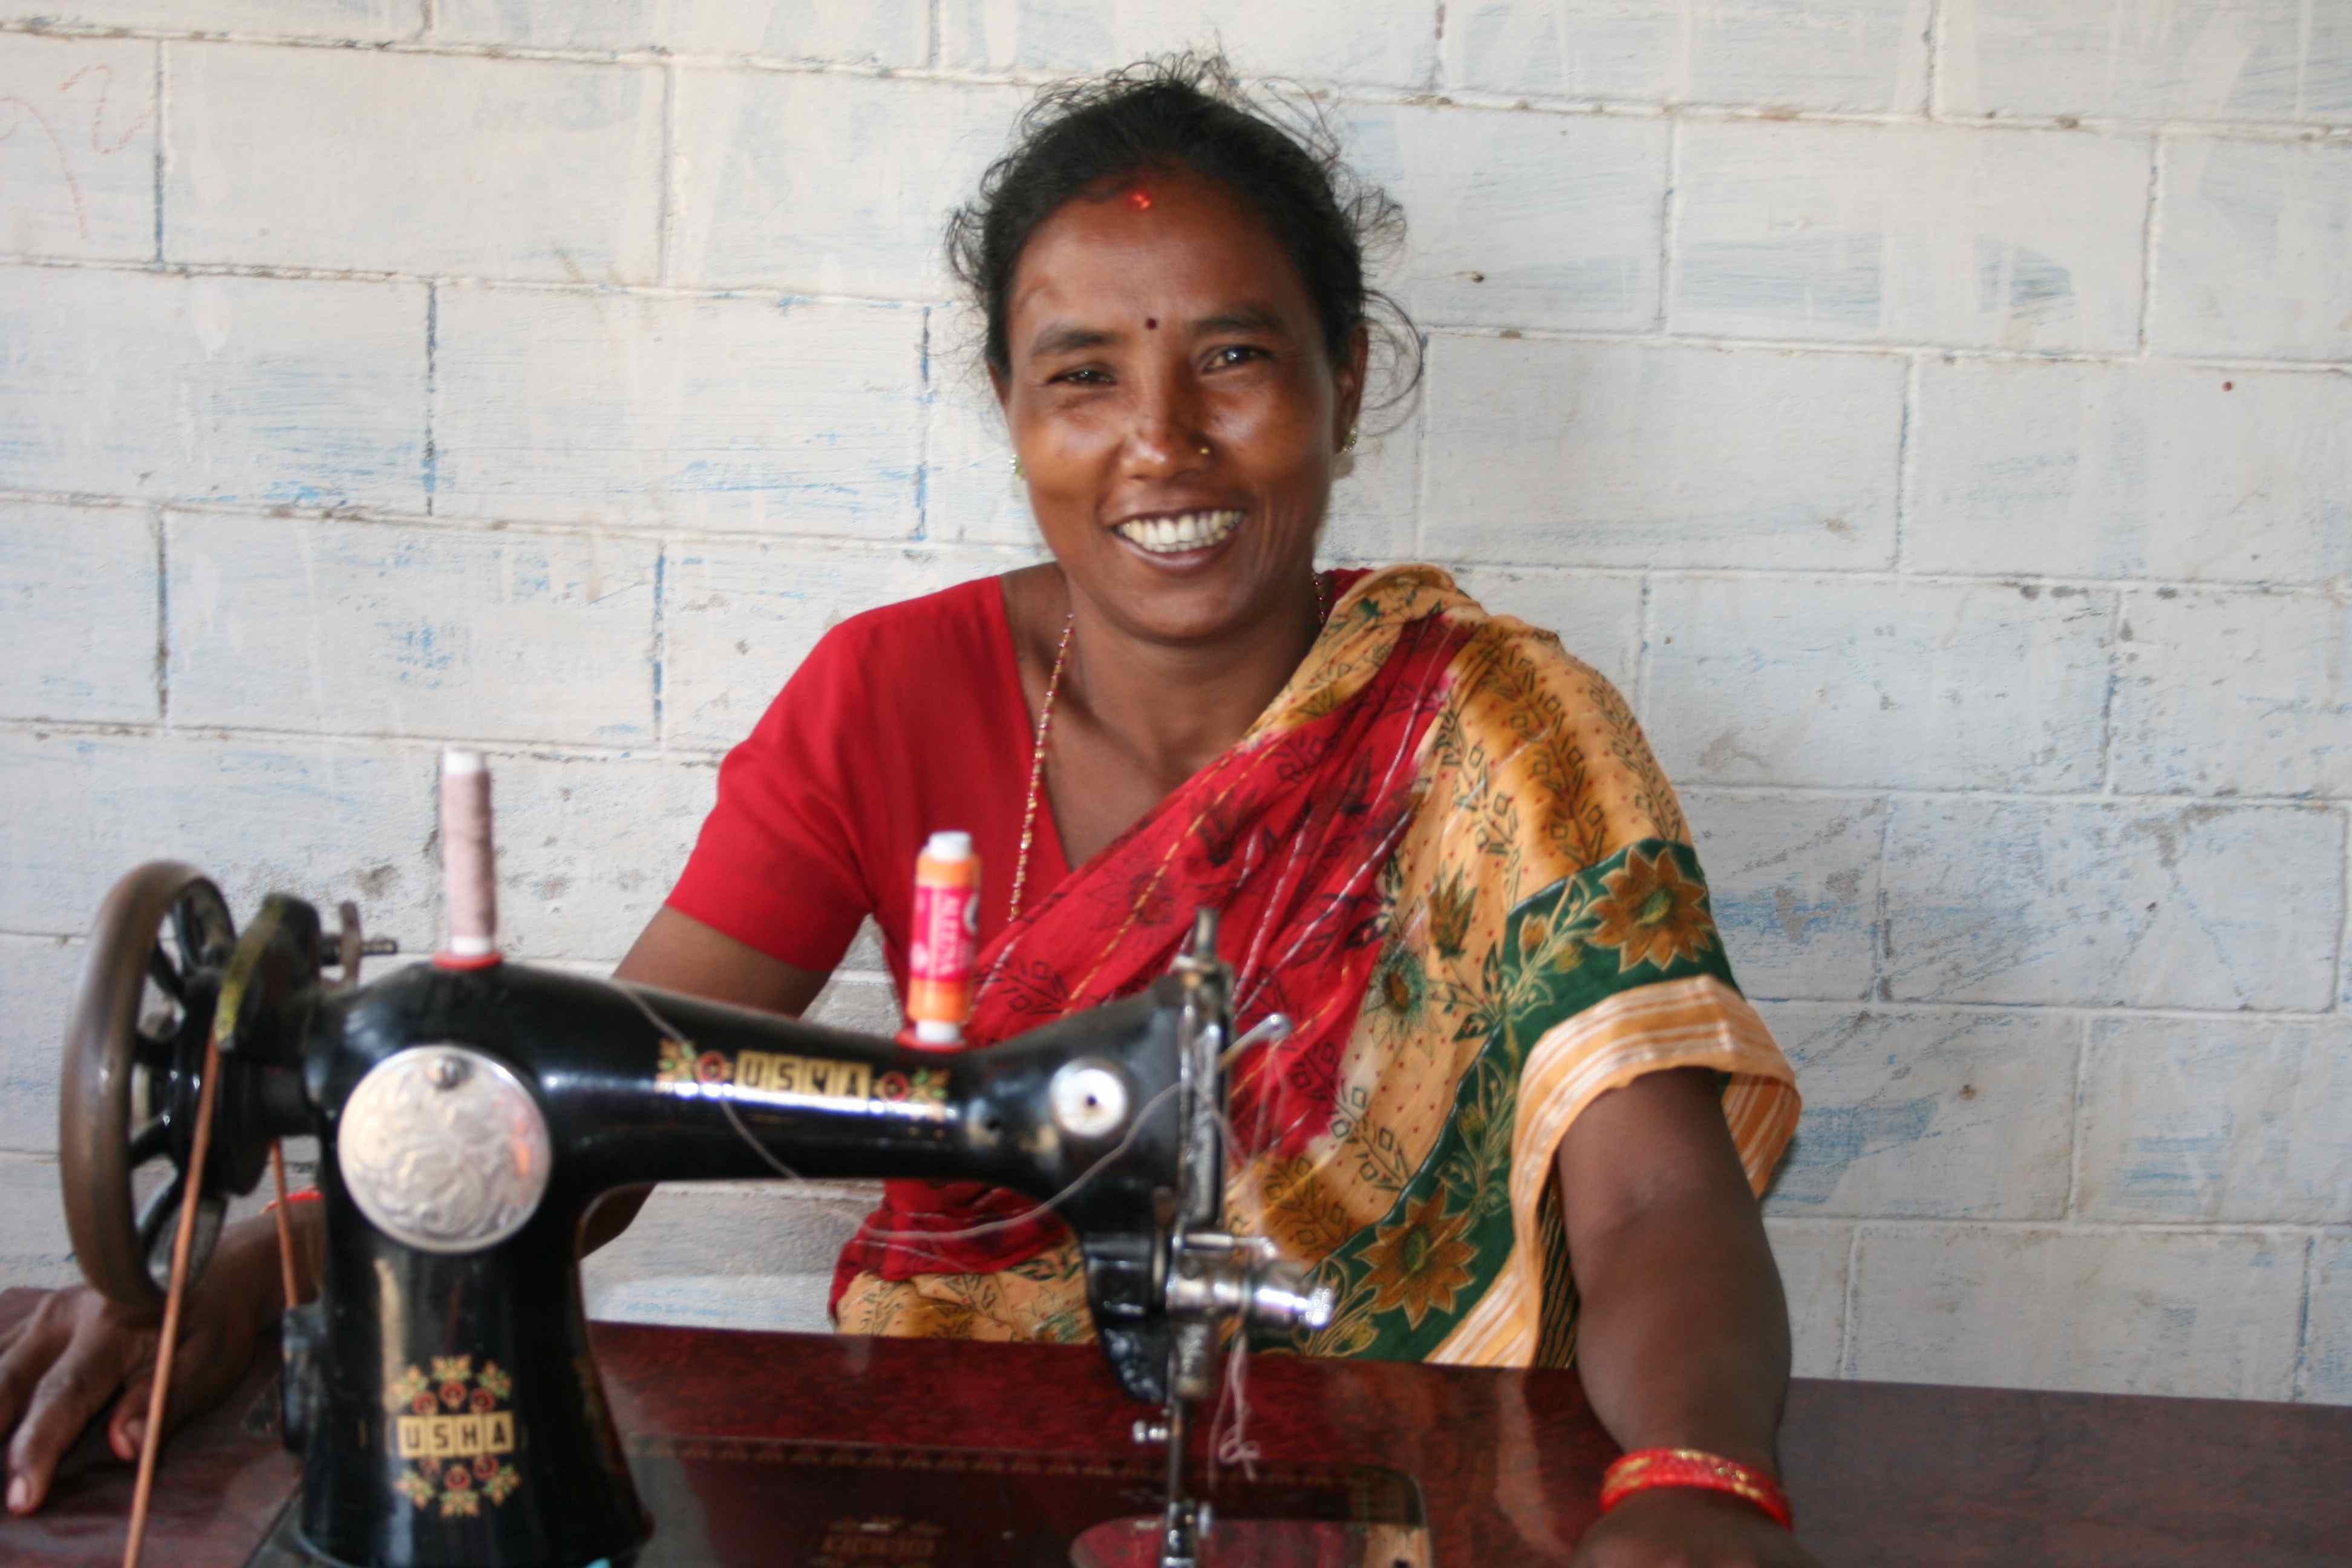 Bishnu ved Gomas maskine